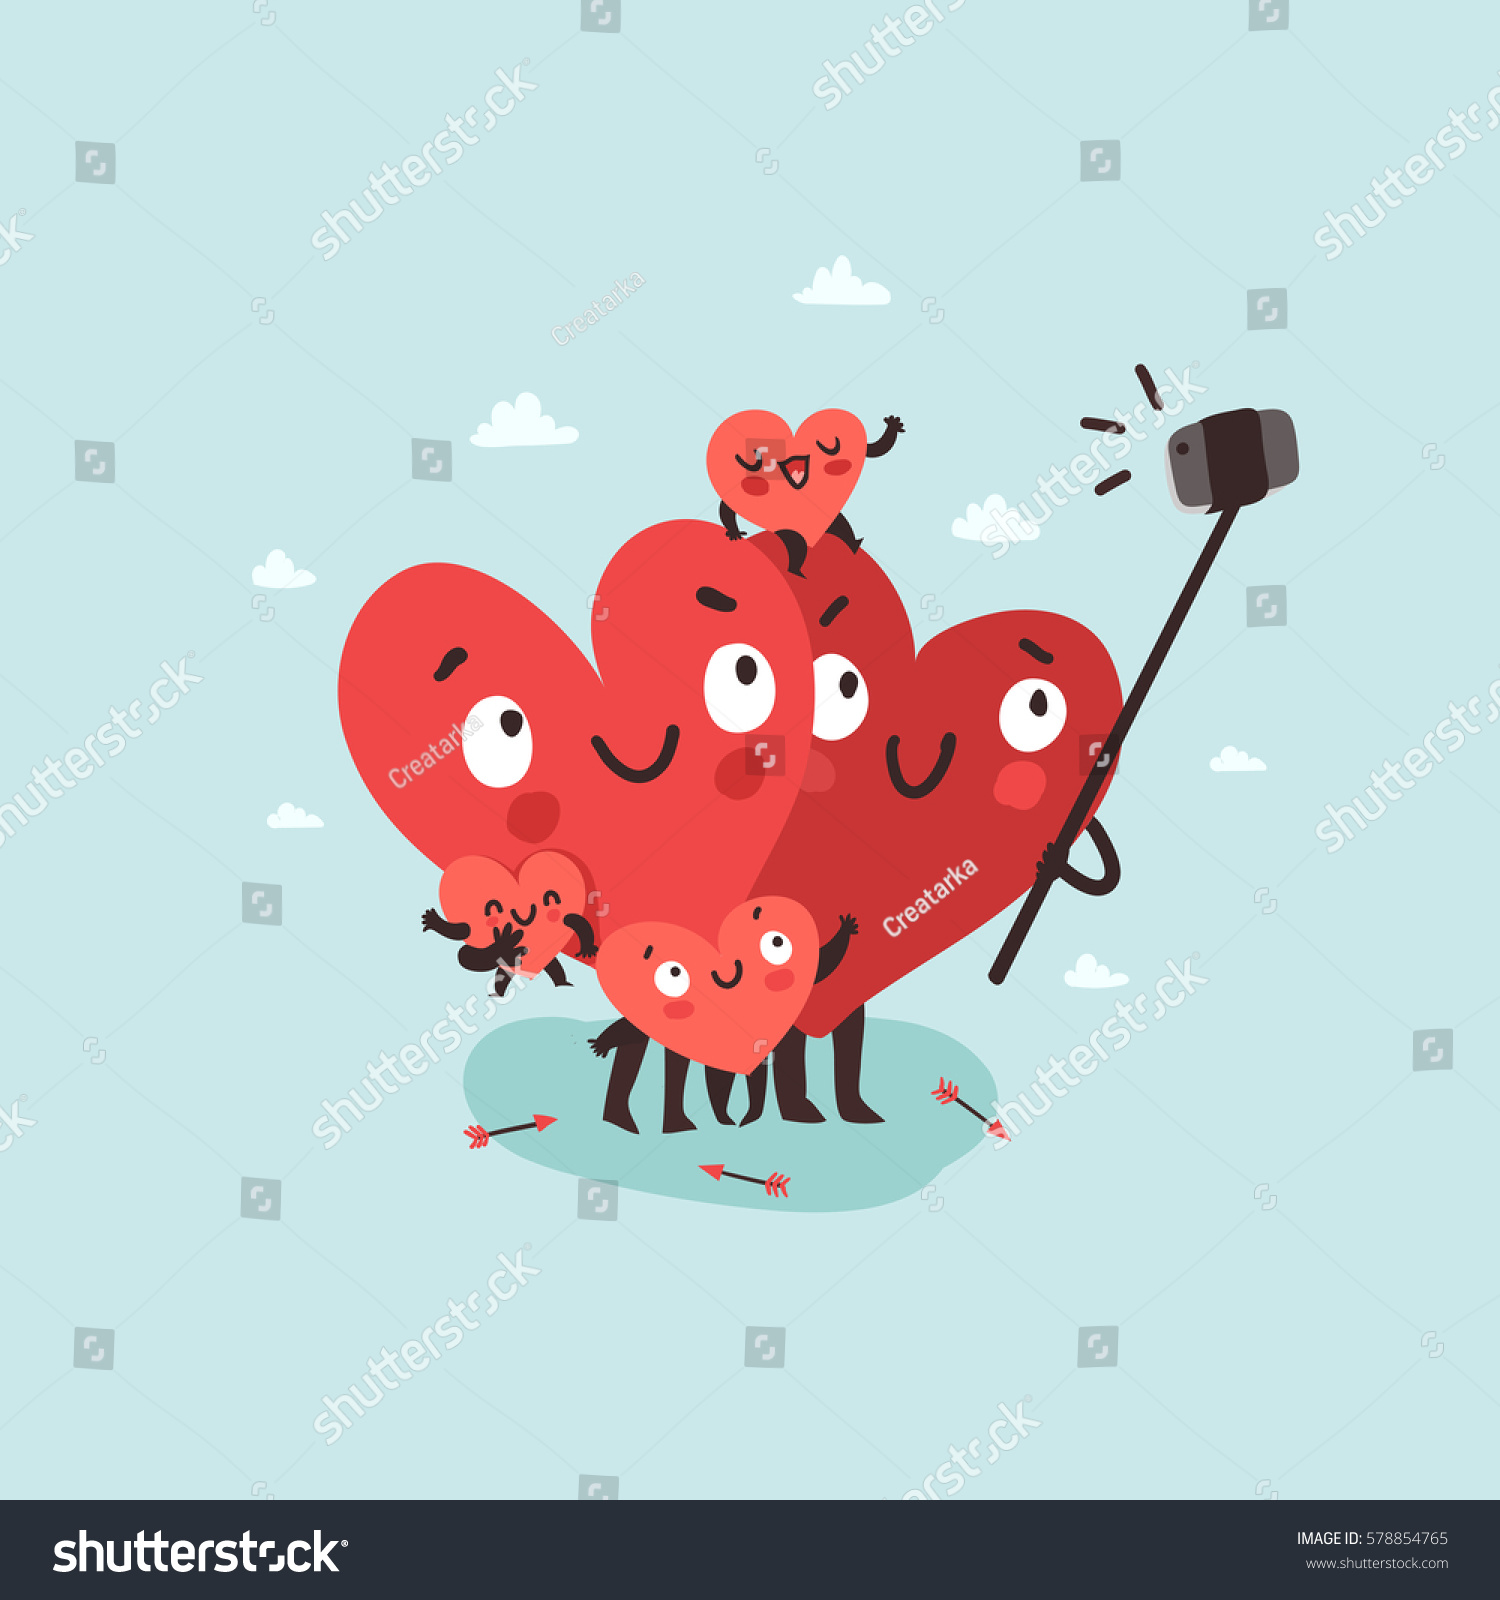 Family Selfie Hearts Characters Symbols Love Stock Vector Royalty